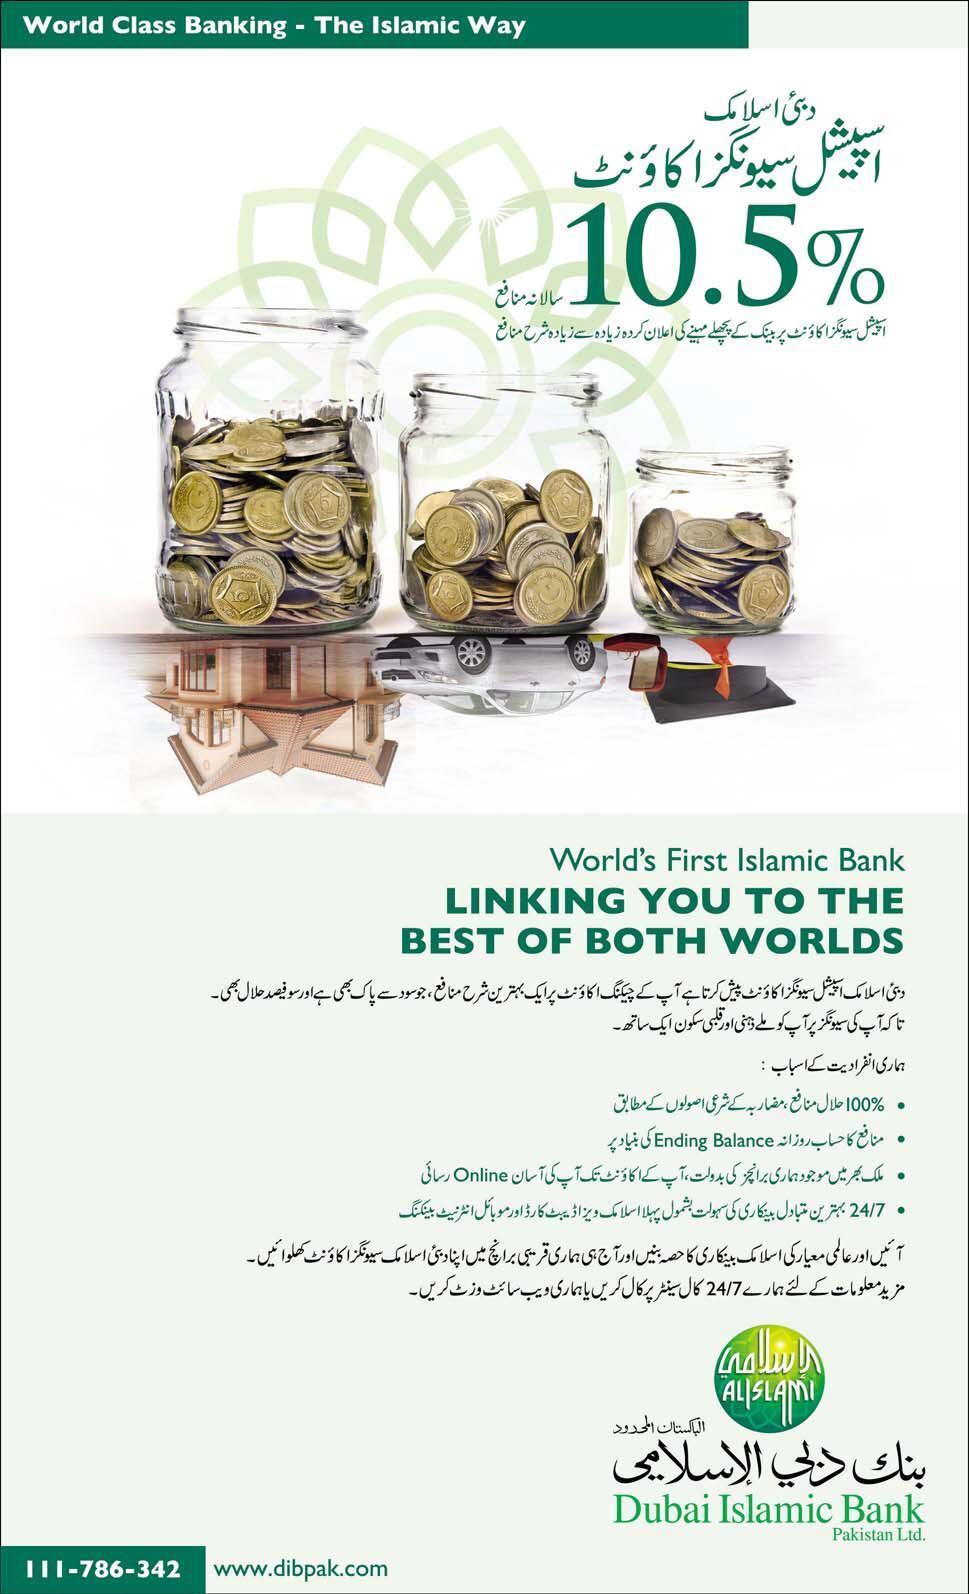 current issues of the world dubai islamic special saving account  dubai islamic special saving account of bubai islamic bank limited dibpak com 111 786 342